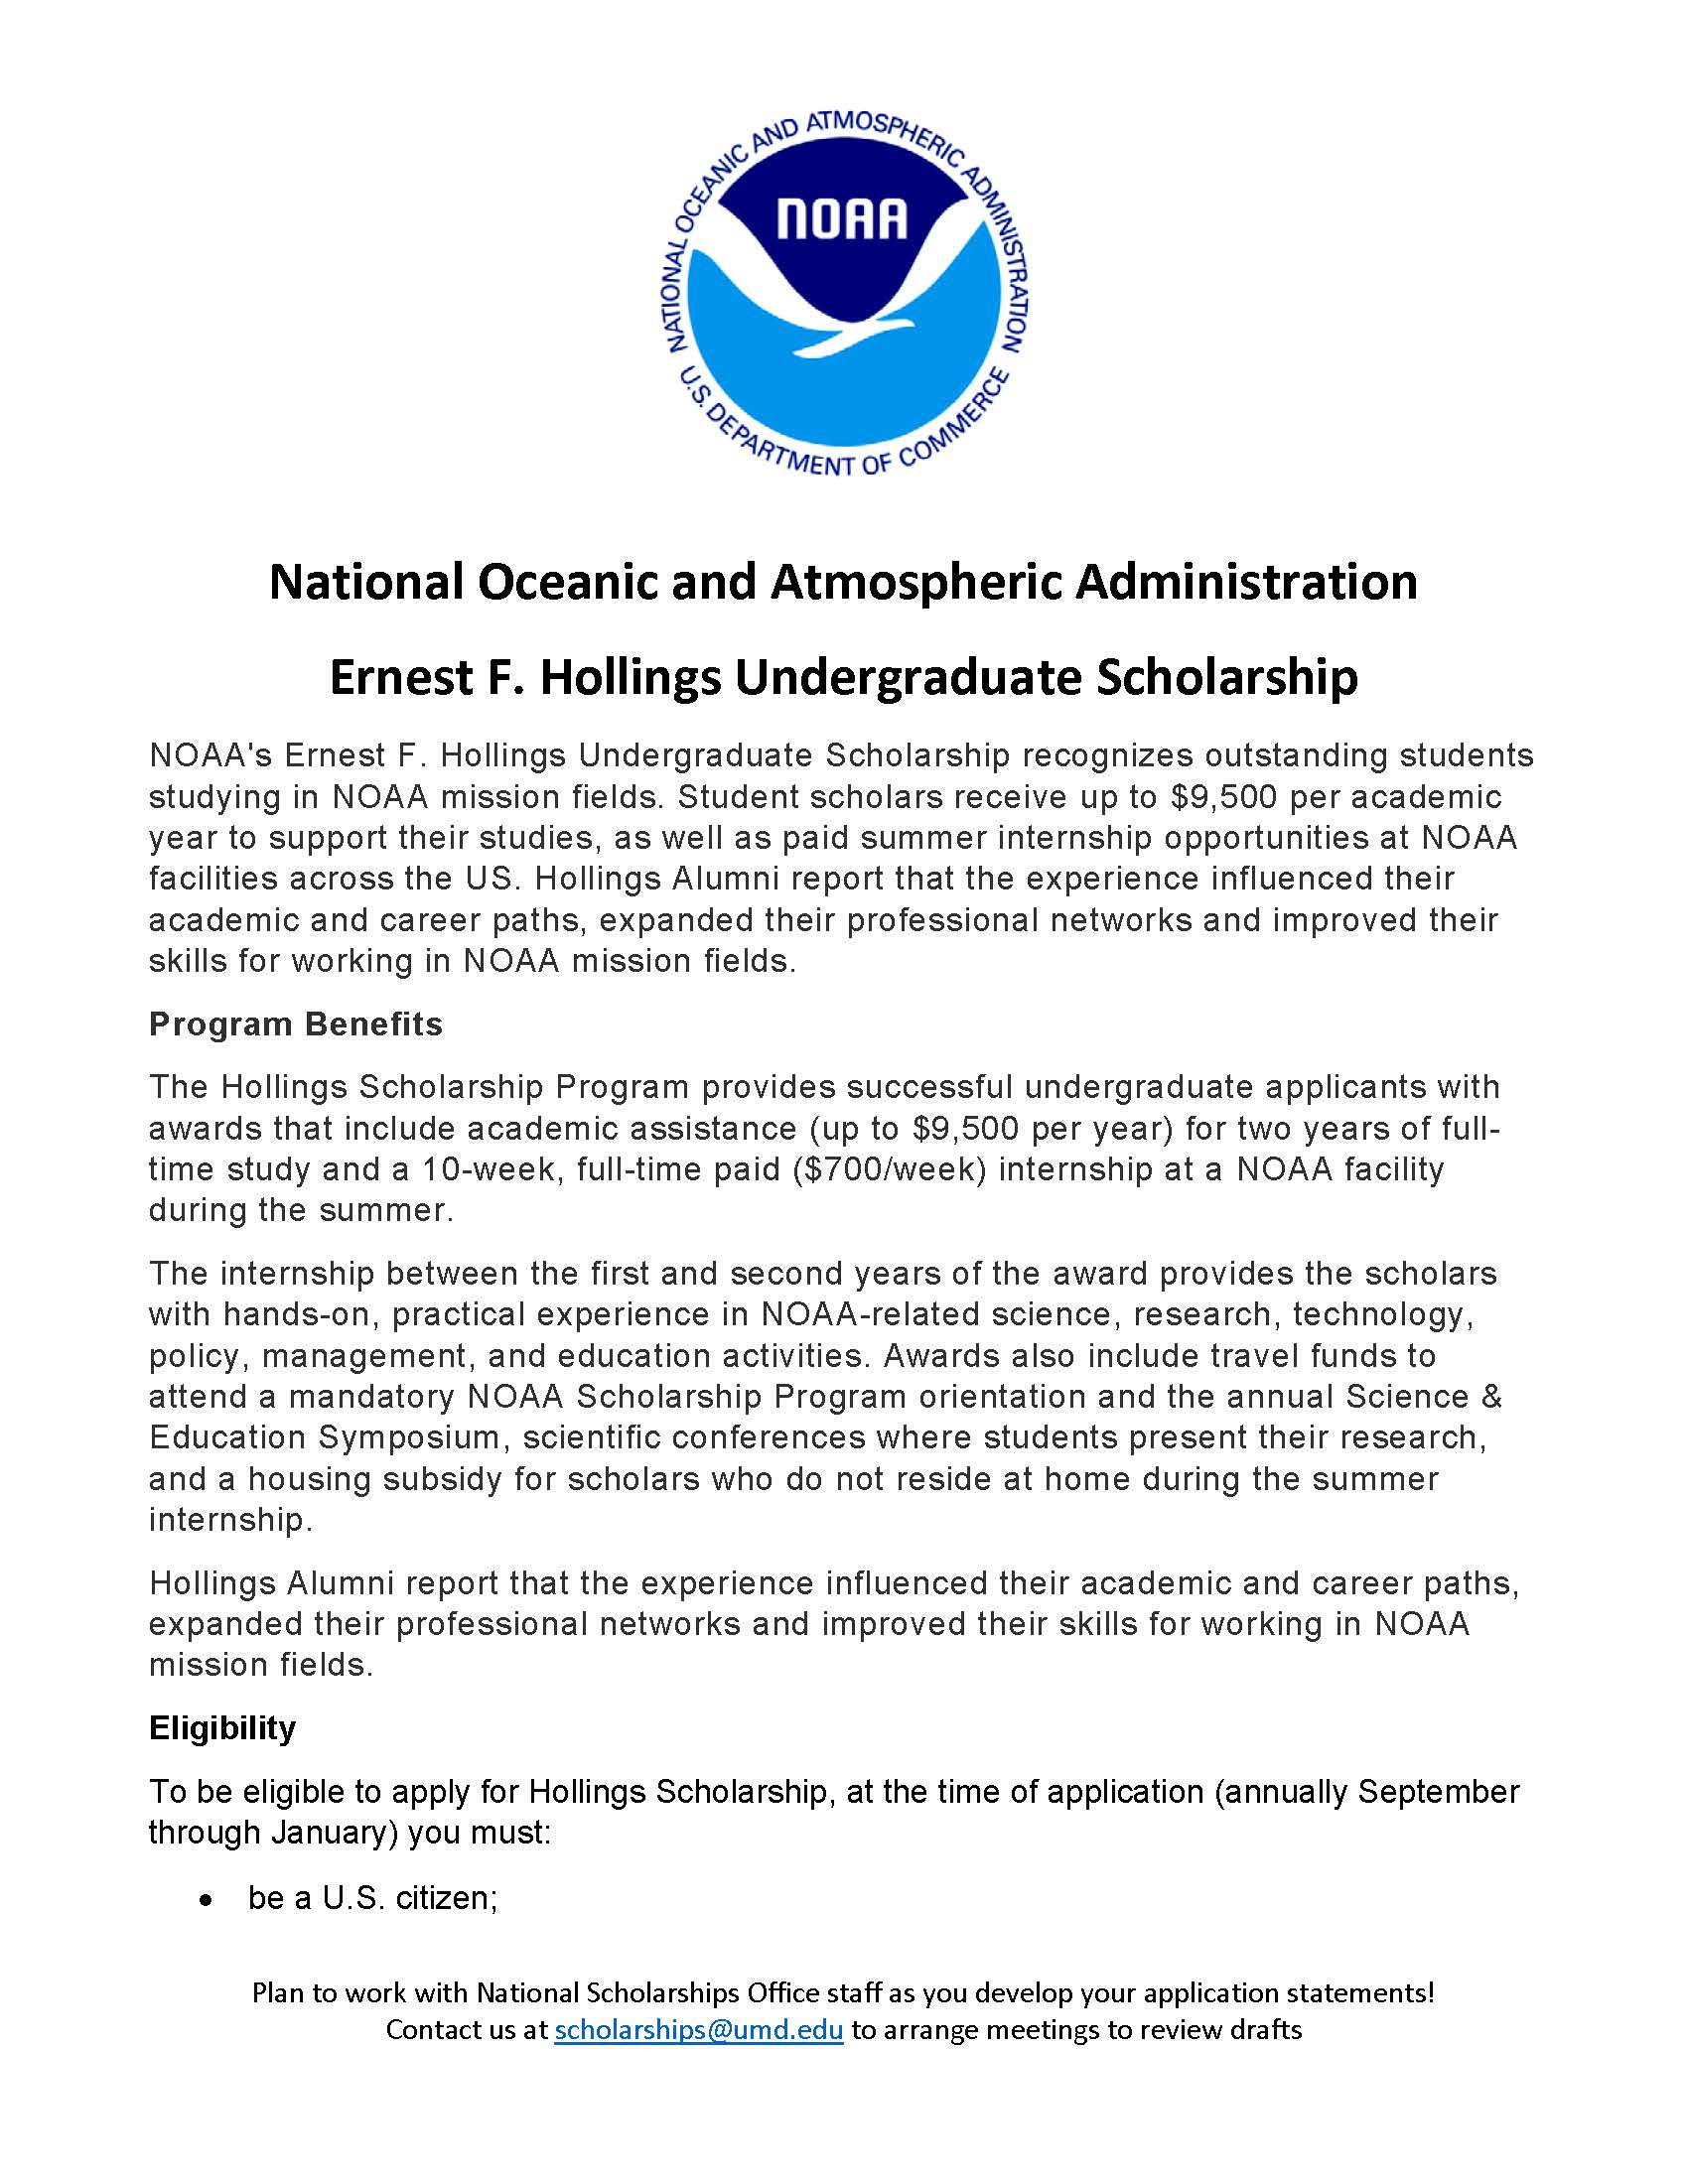 Hollings Environmental Policy & Sciences - Program Description Handout_Page_1.jpg